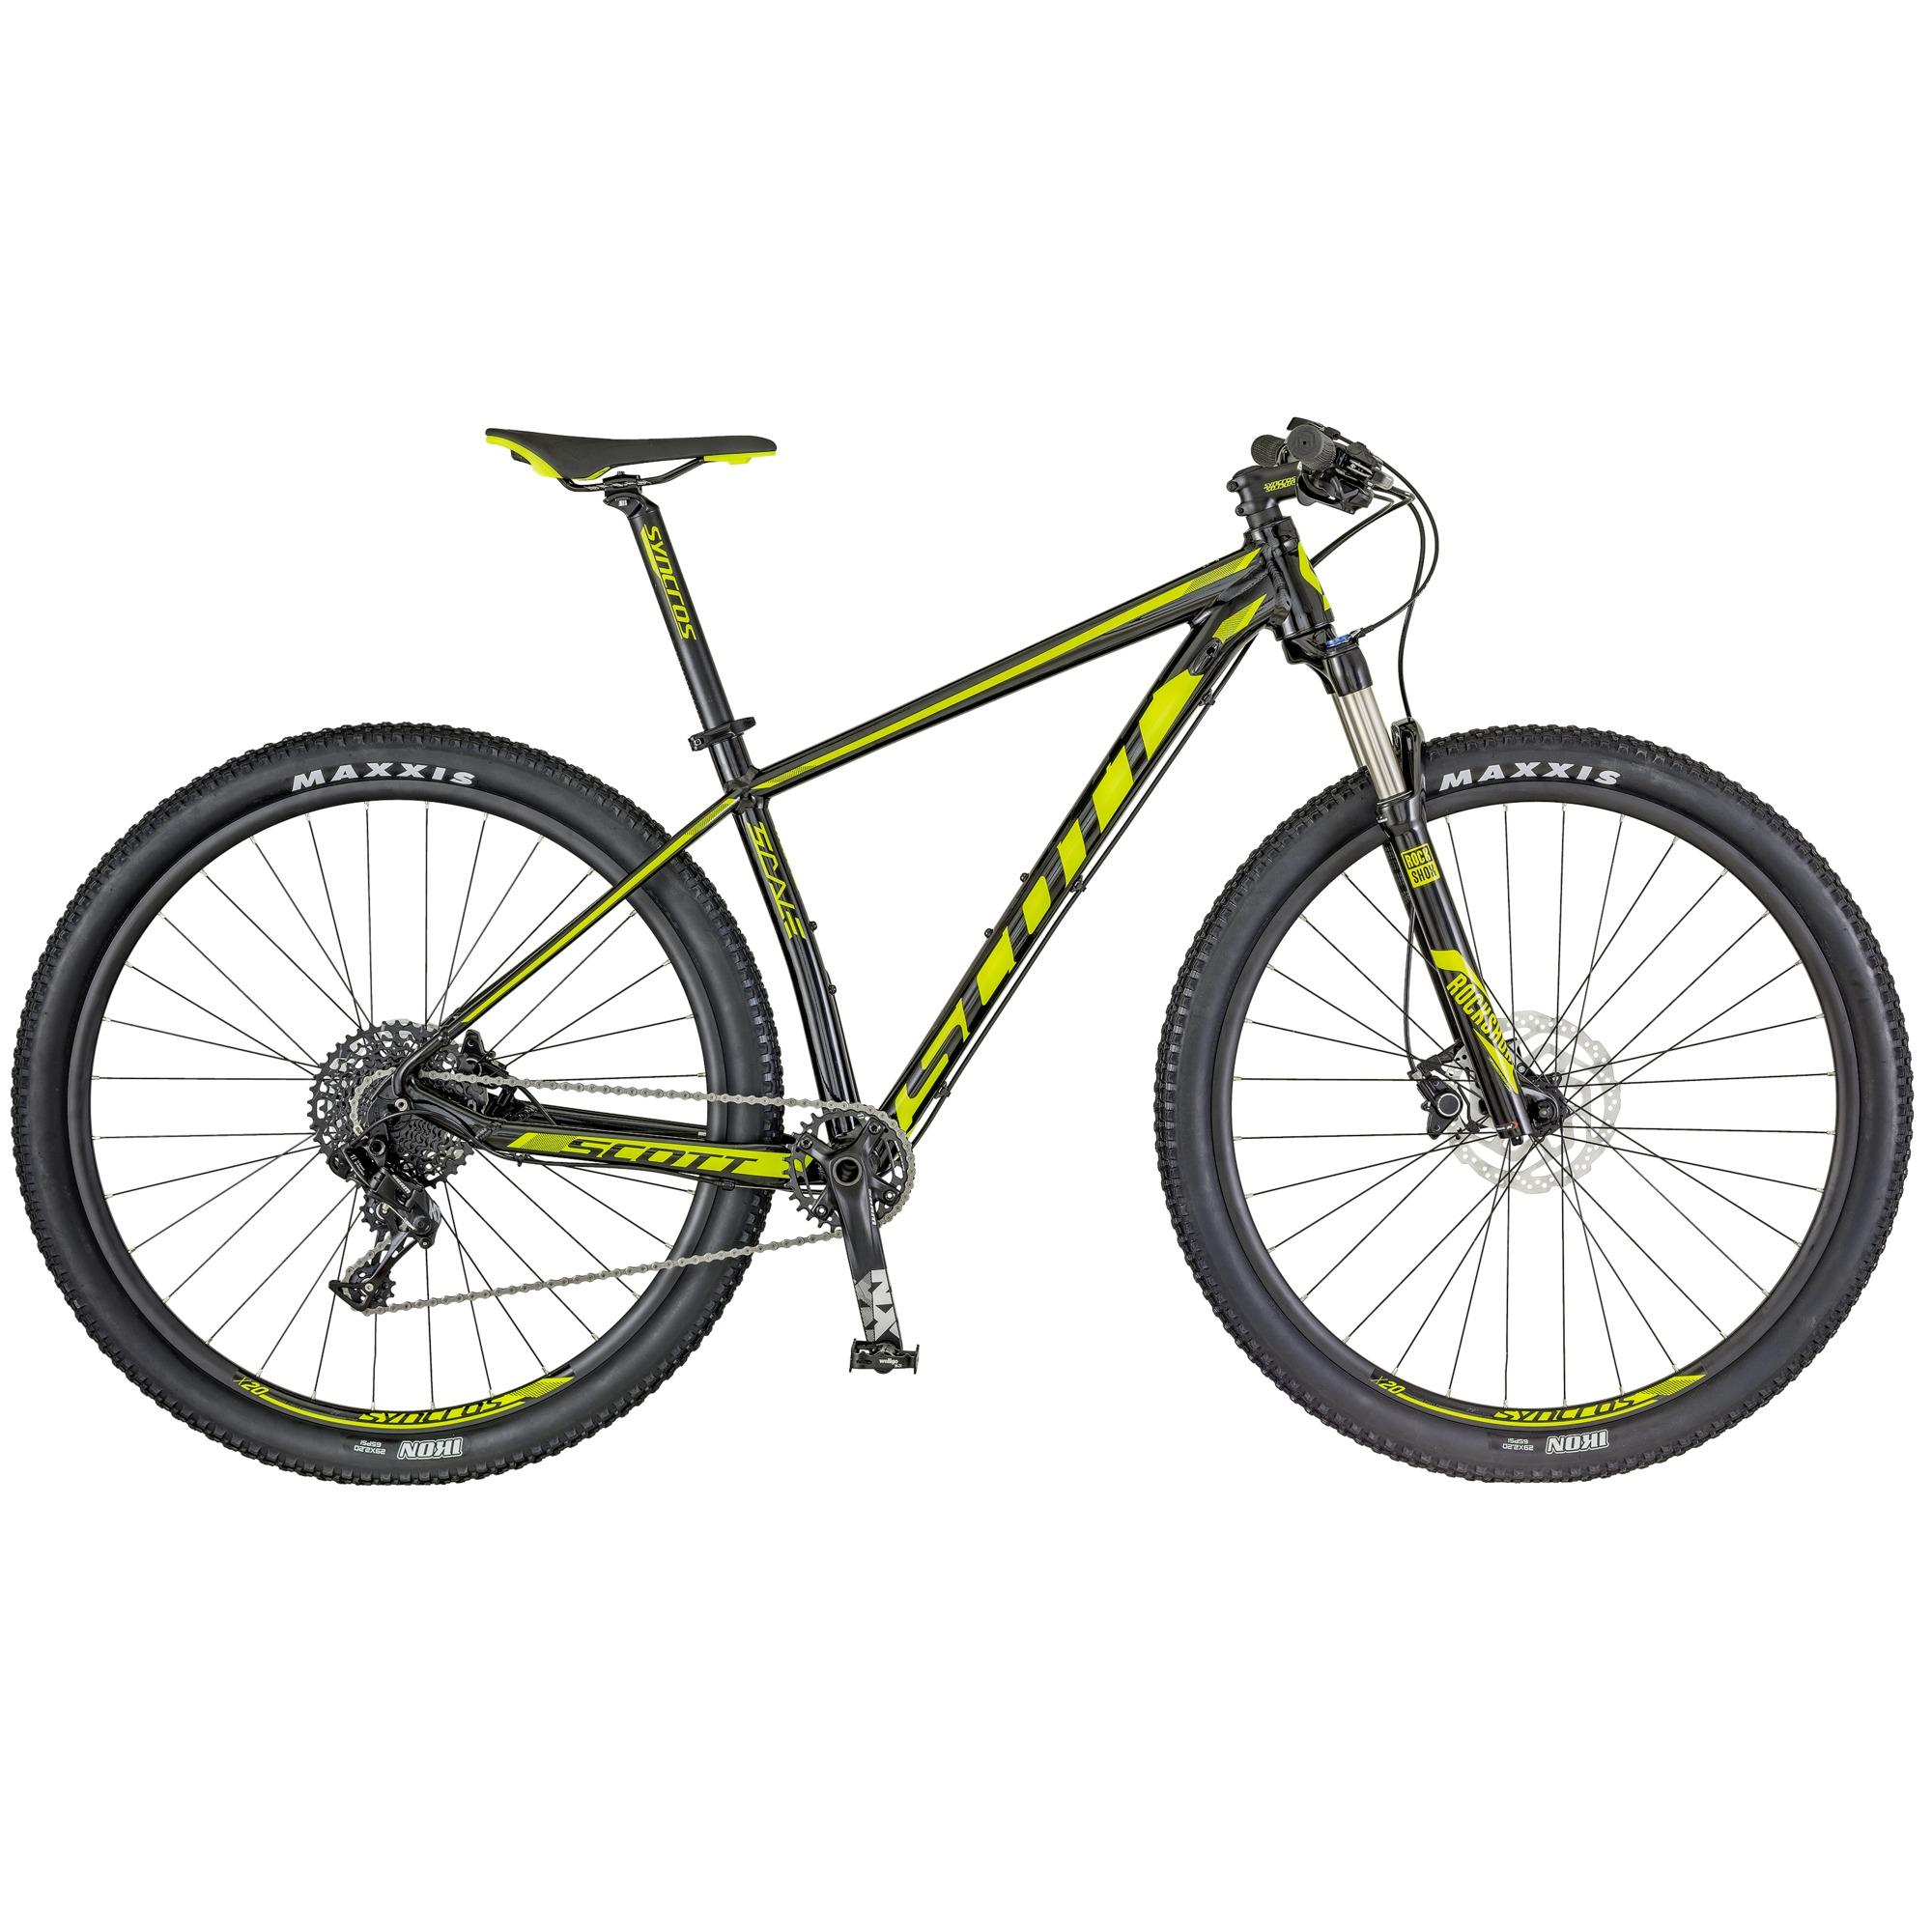 Scott 2018 Scale 980 Bicycle Alloy Black, Neon Yellow